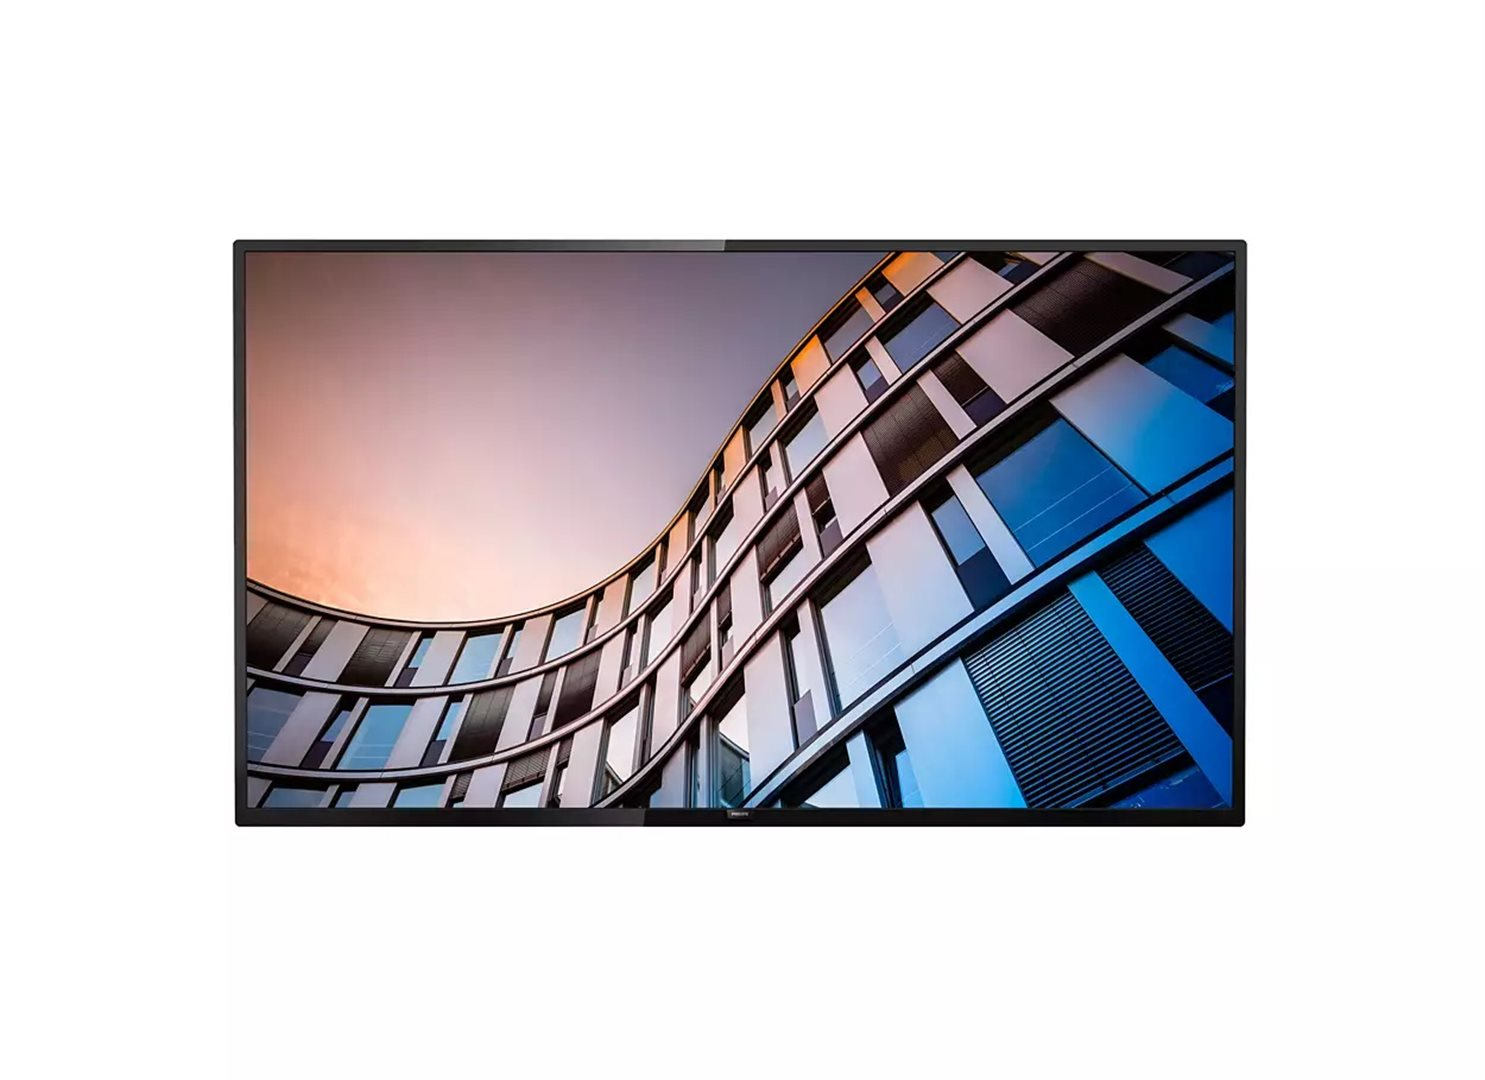 65'' D-LED Philips 65BFL2114-UHD,IPS,350cd,TV,16/7 - 65BFL2114/12